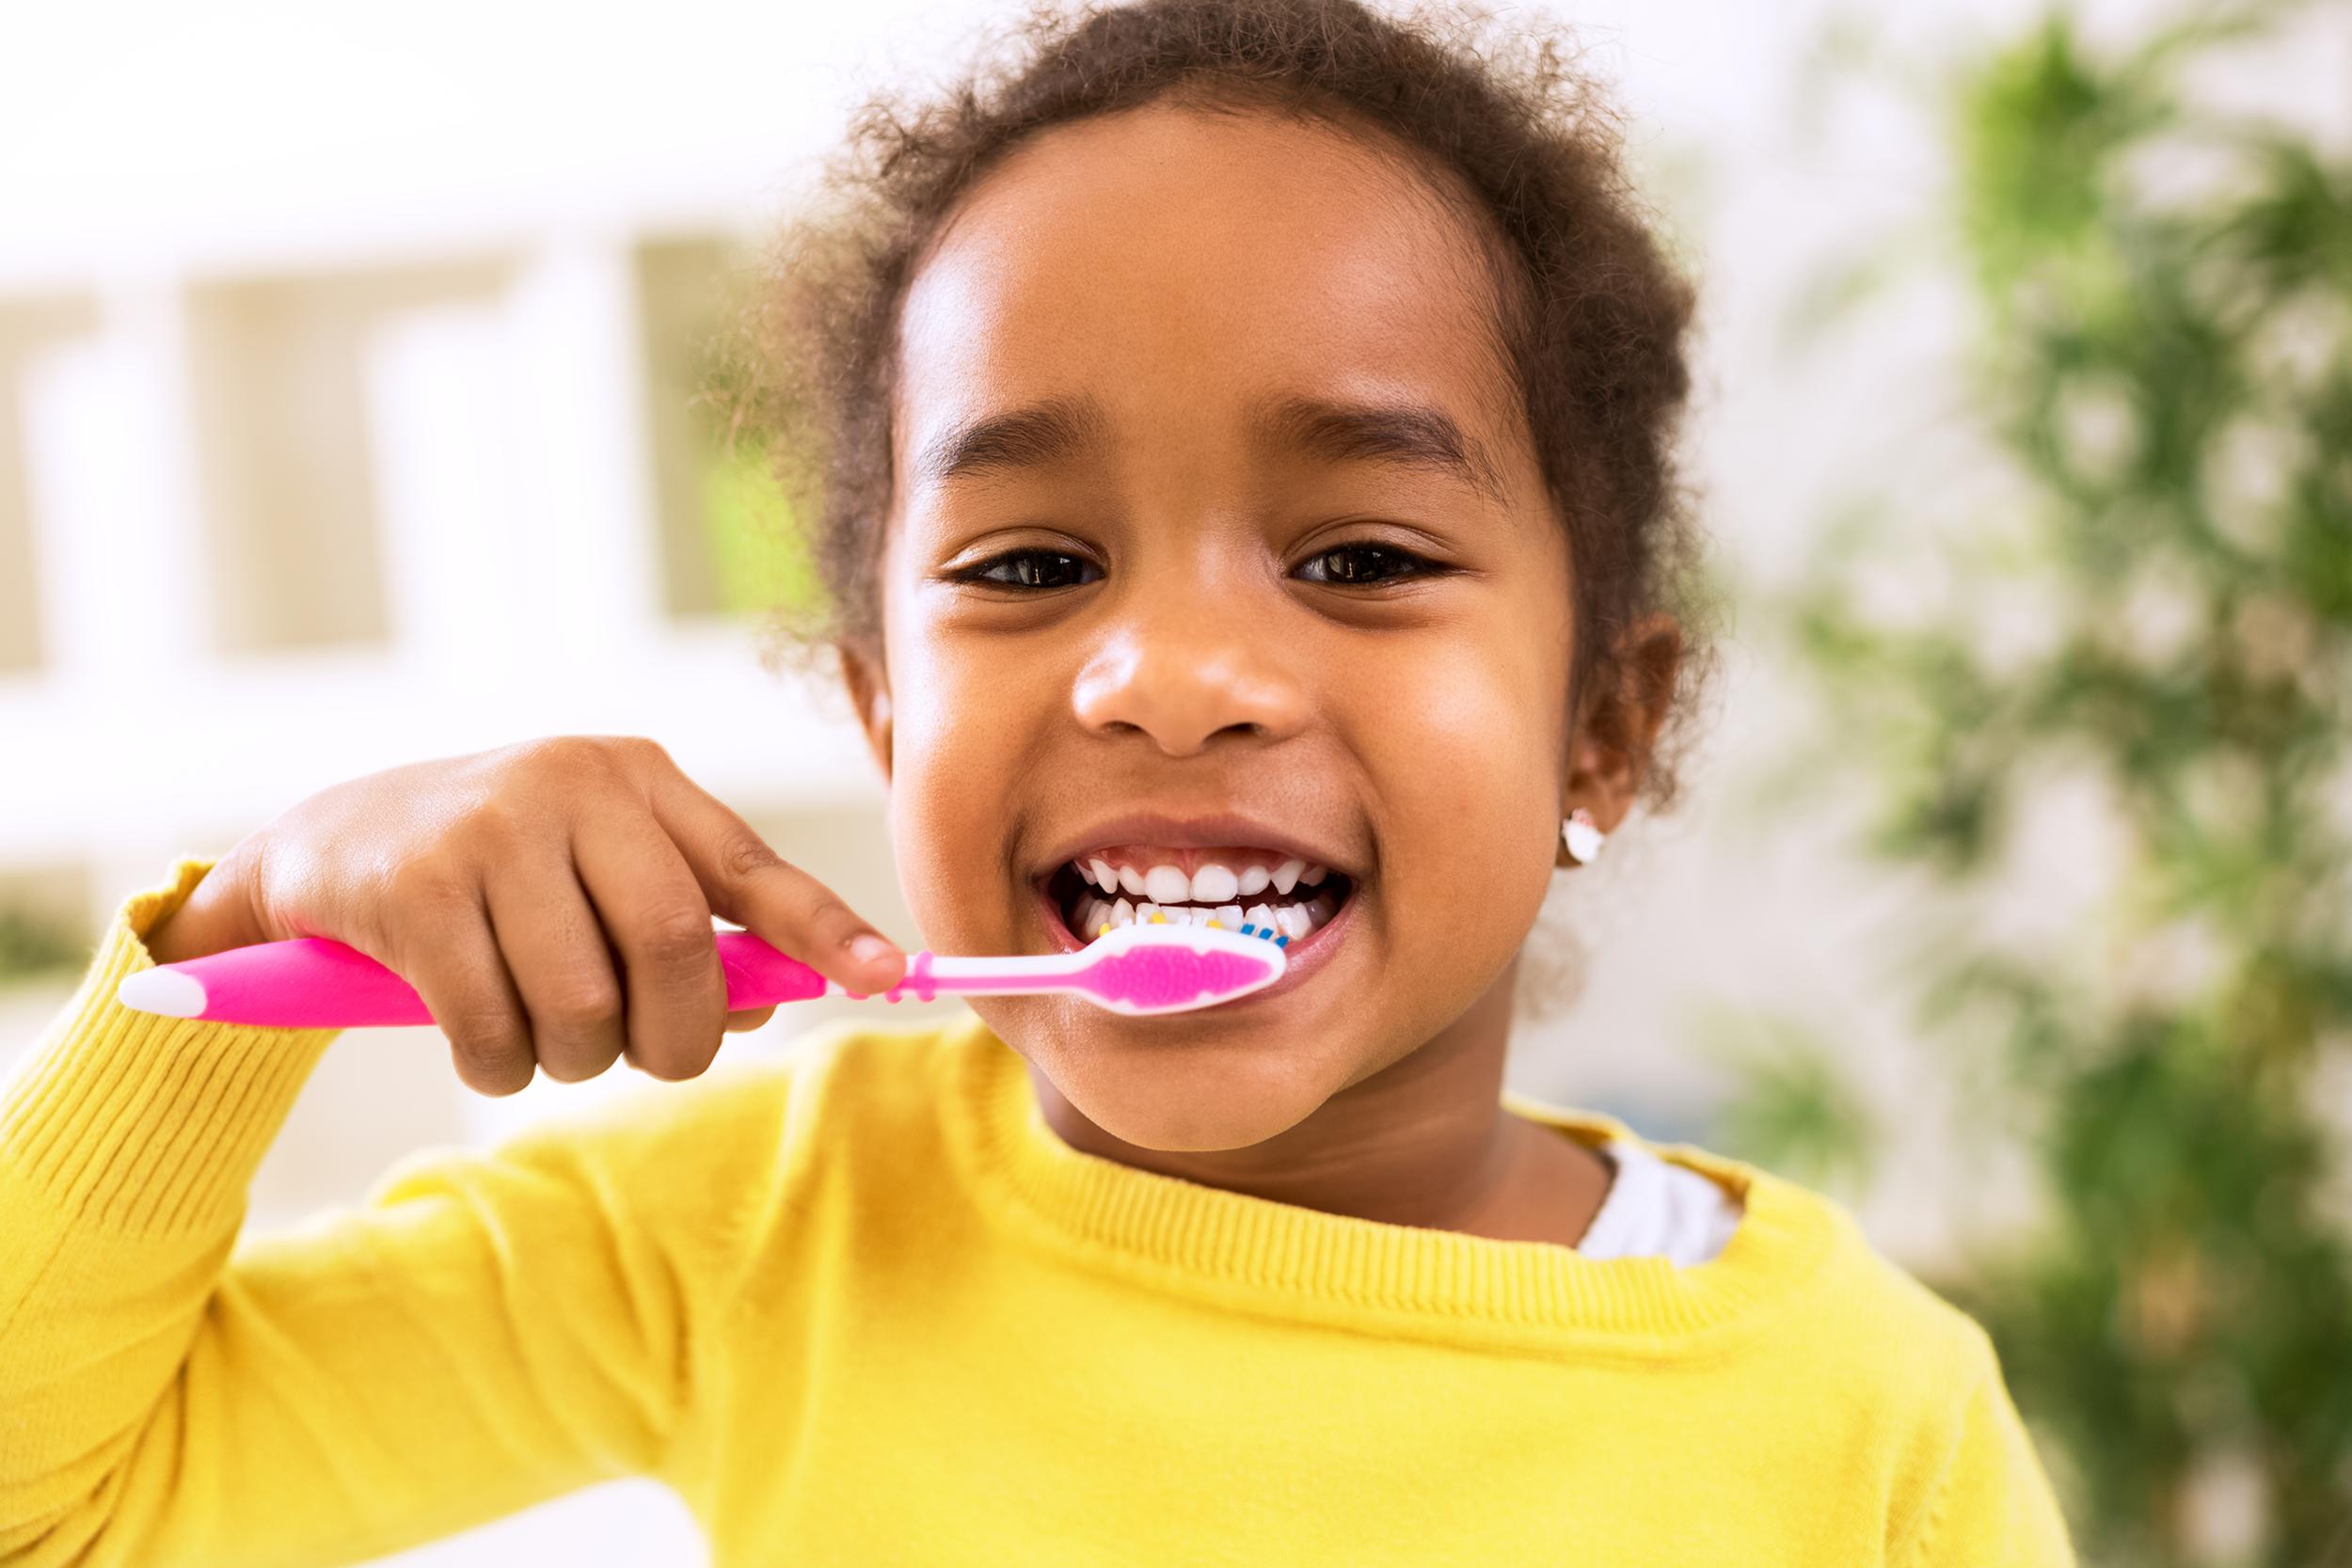 liquid-fillings-girl-brushing-teeth-pediatric-dentistry.png